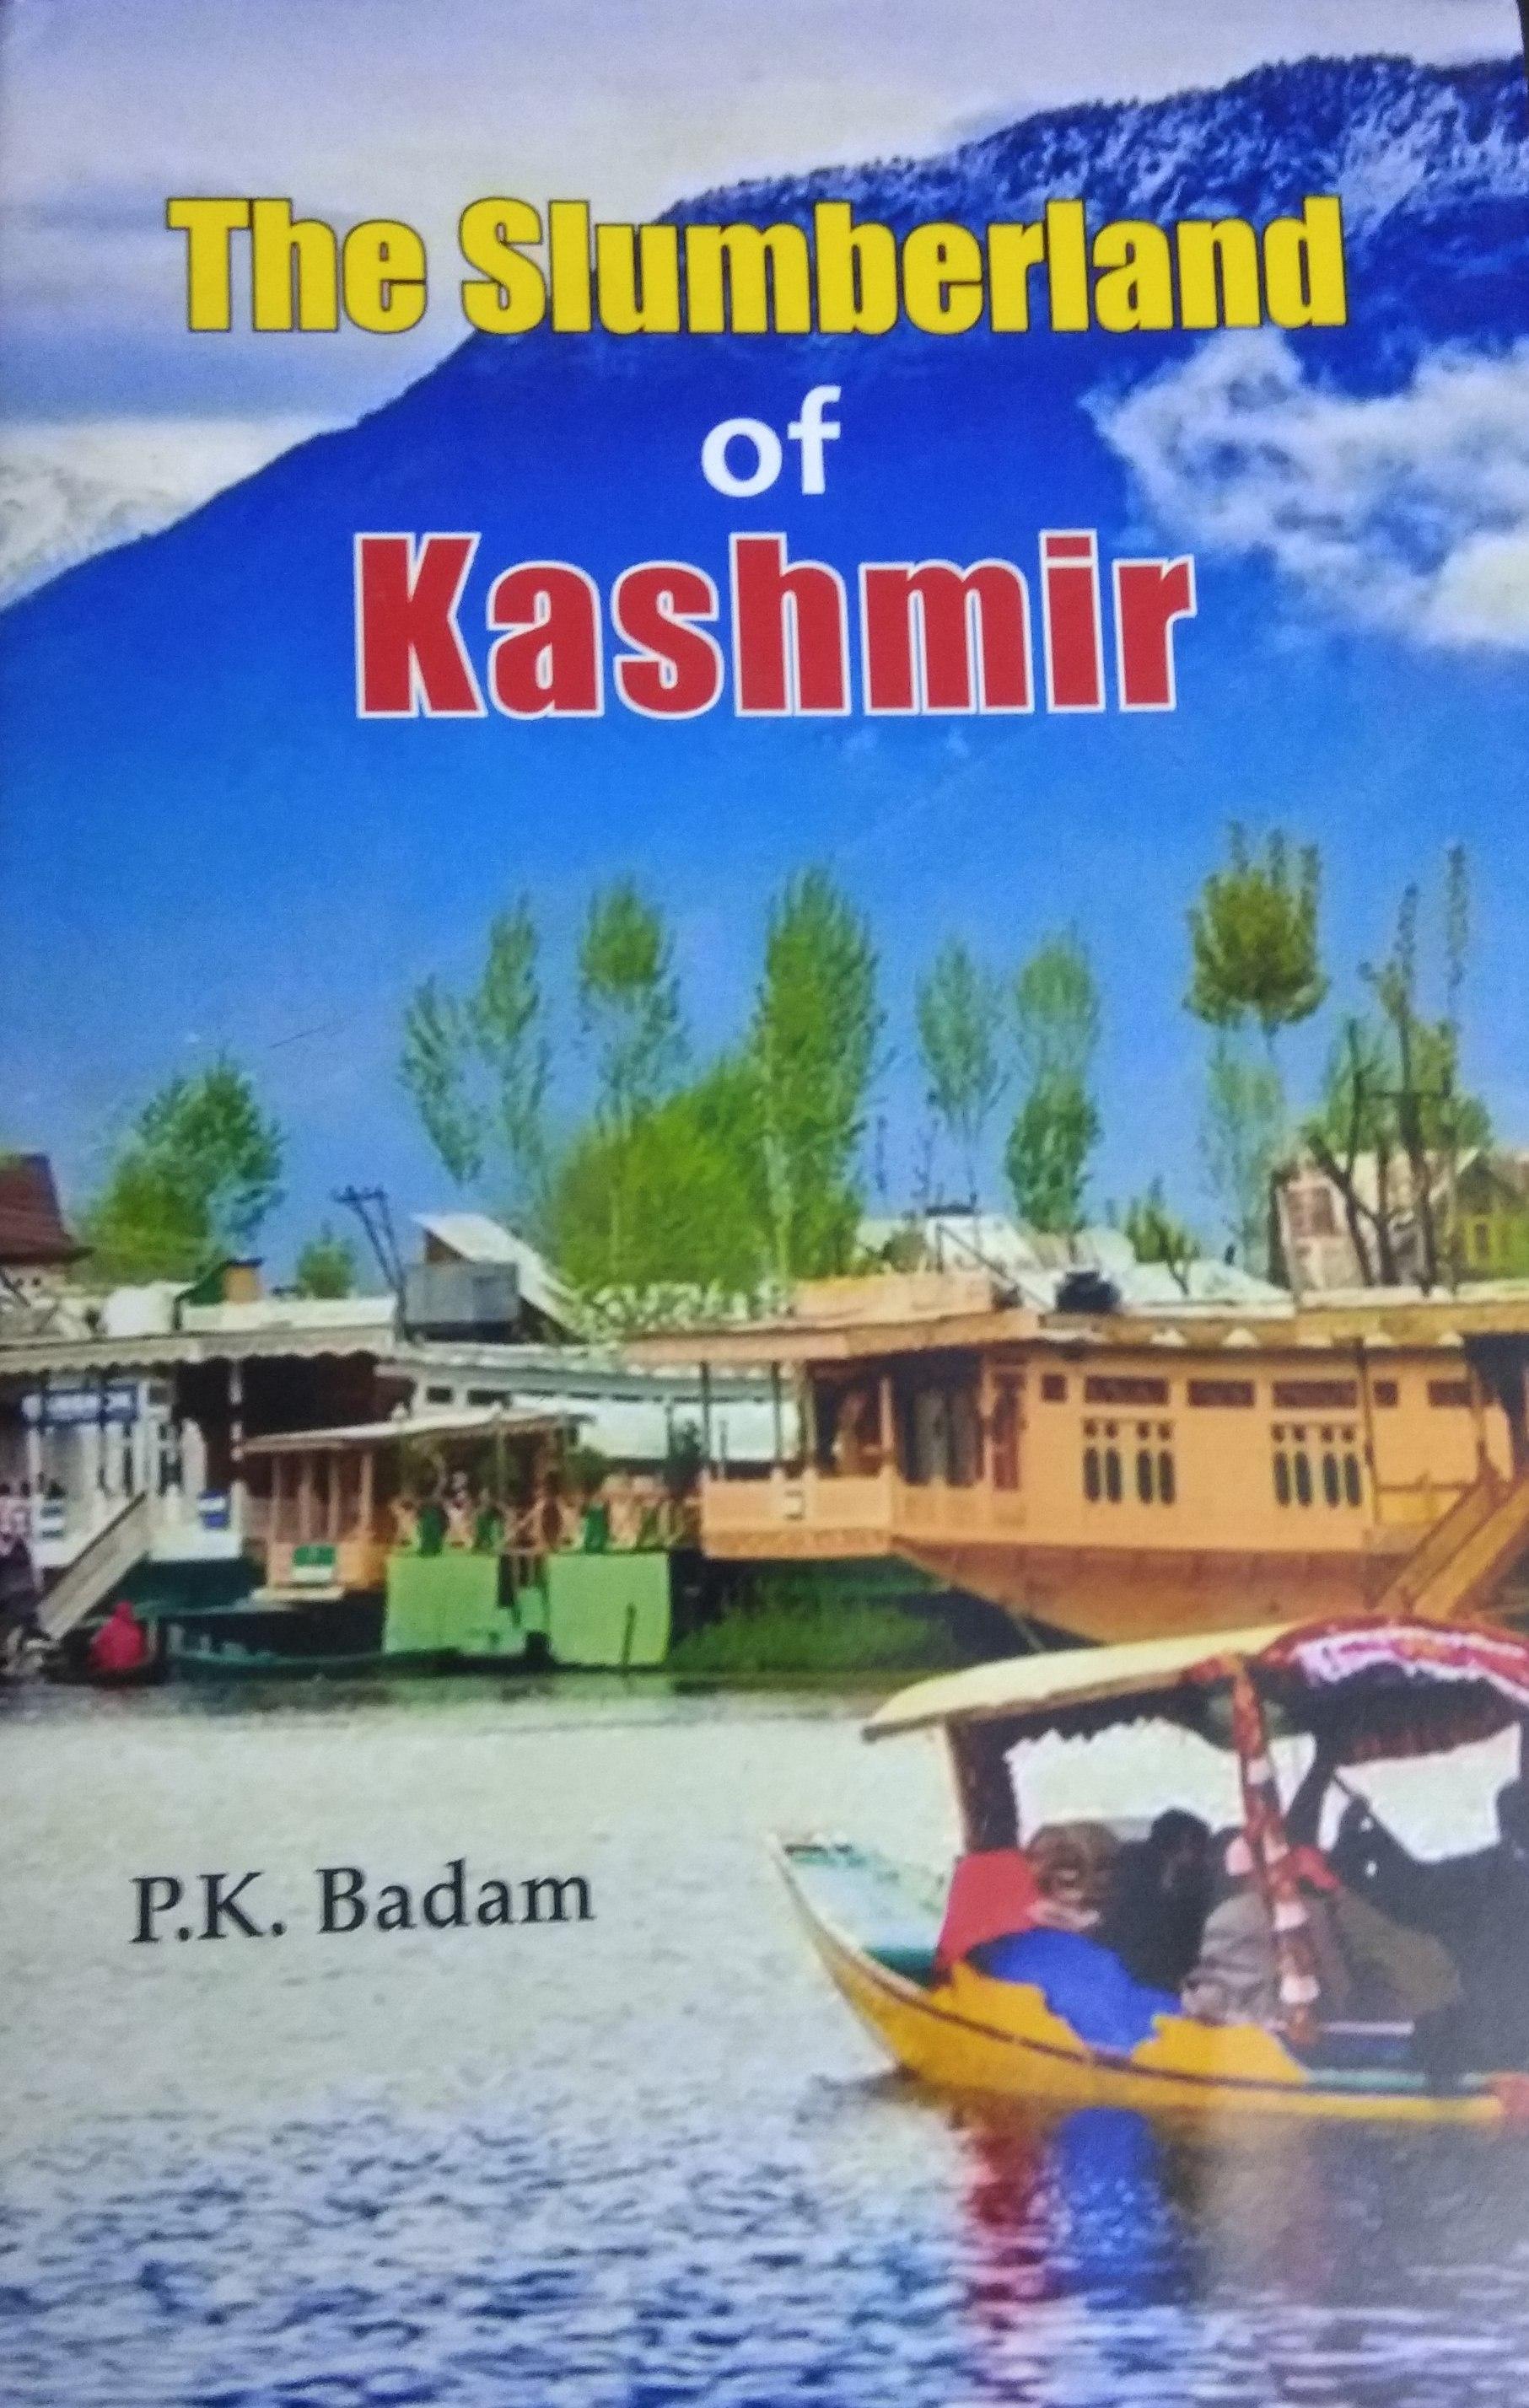 The Slumberland of Kashmir